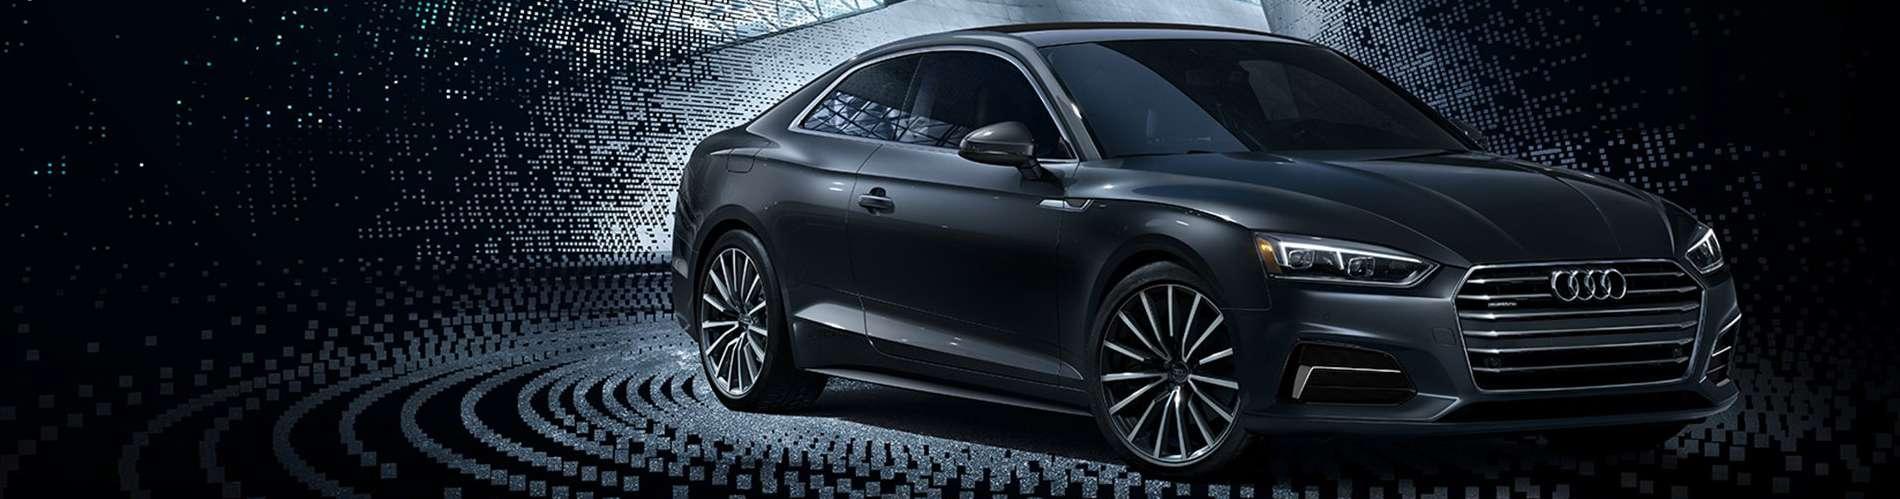 Two Roads. One Destination. - Santa Monica Audi